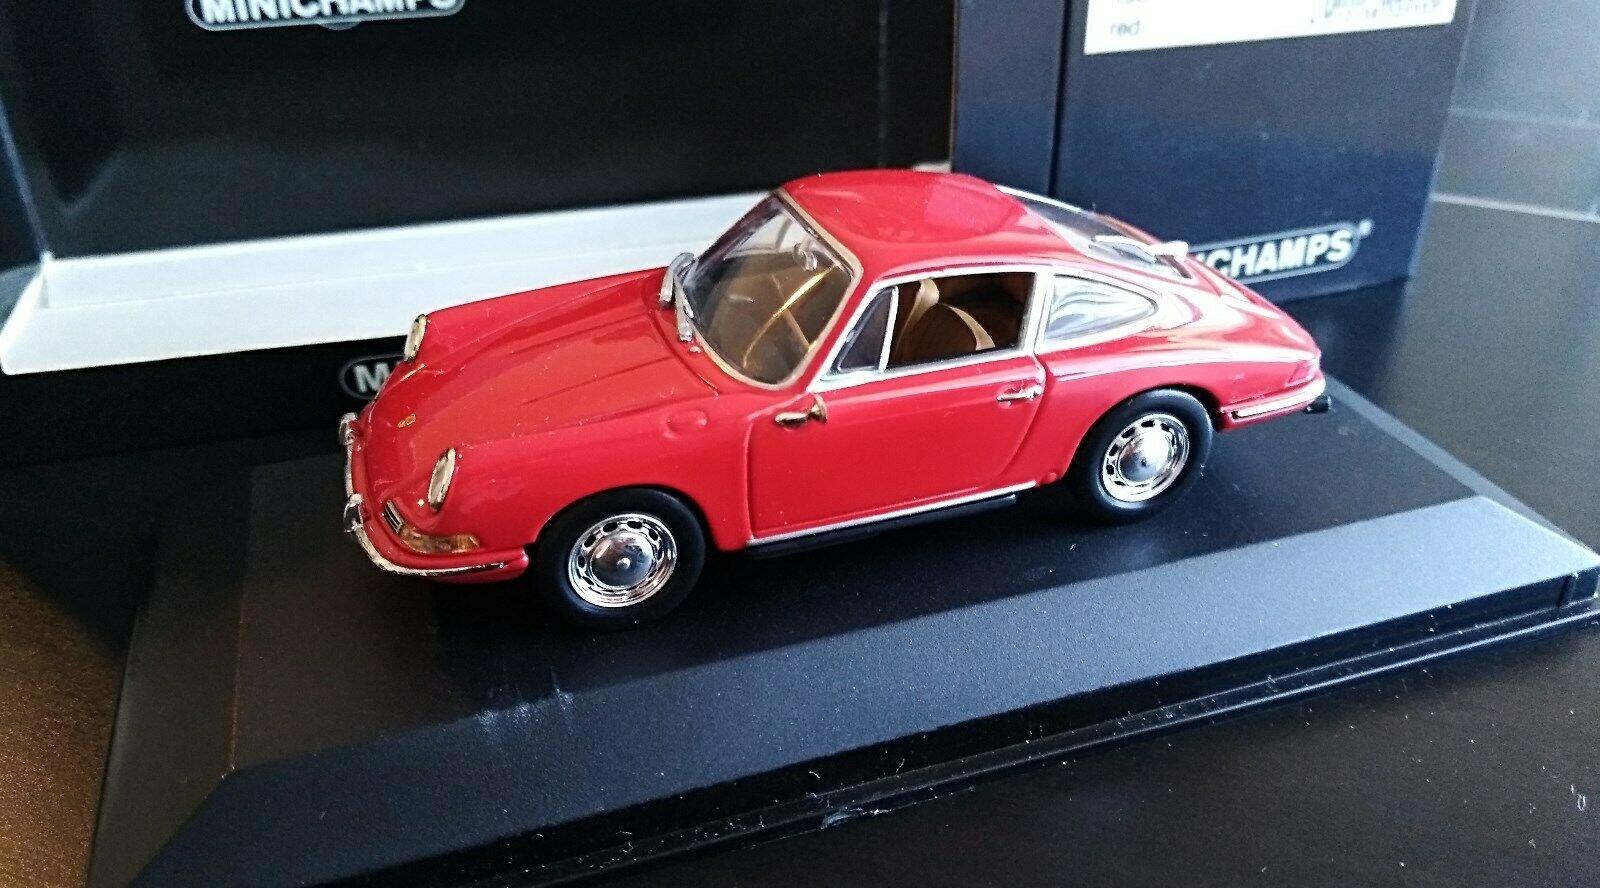 1 43 Minichamps Porsche 911 Coupe 1964 (901) 430067121 rot. Muy raro